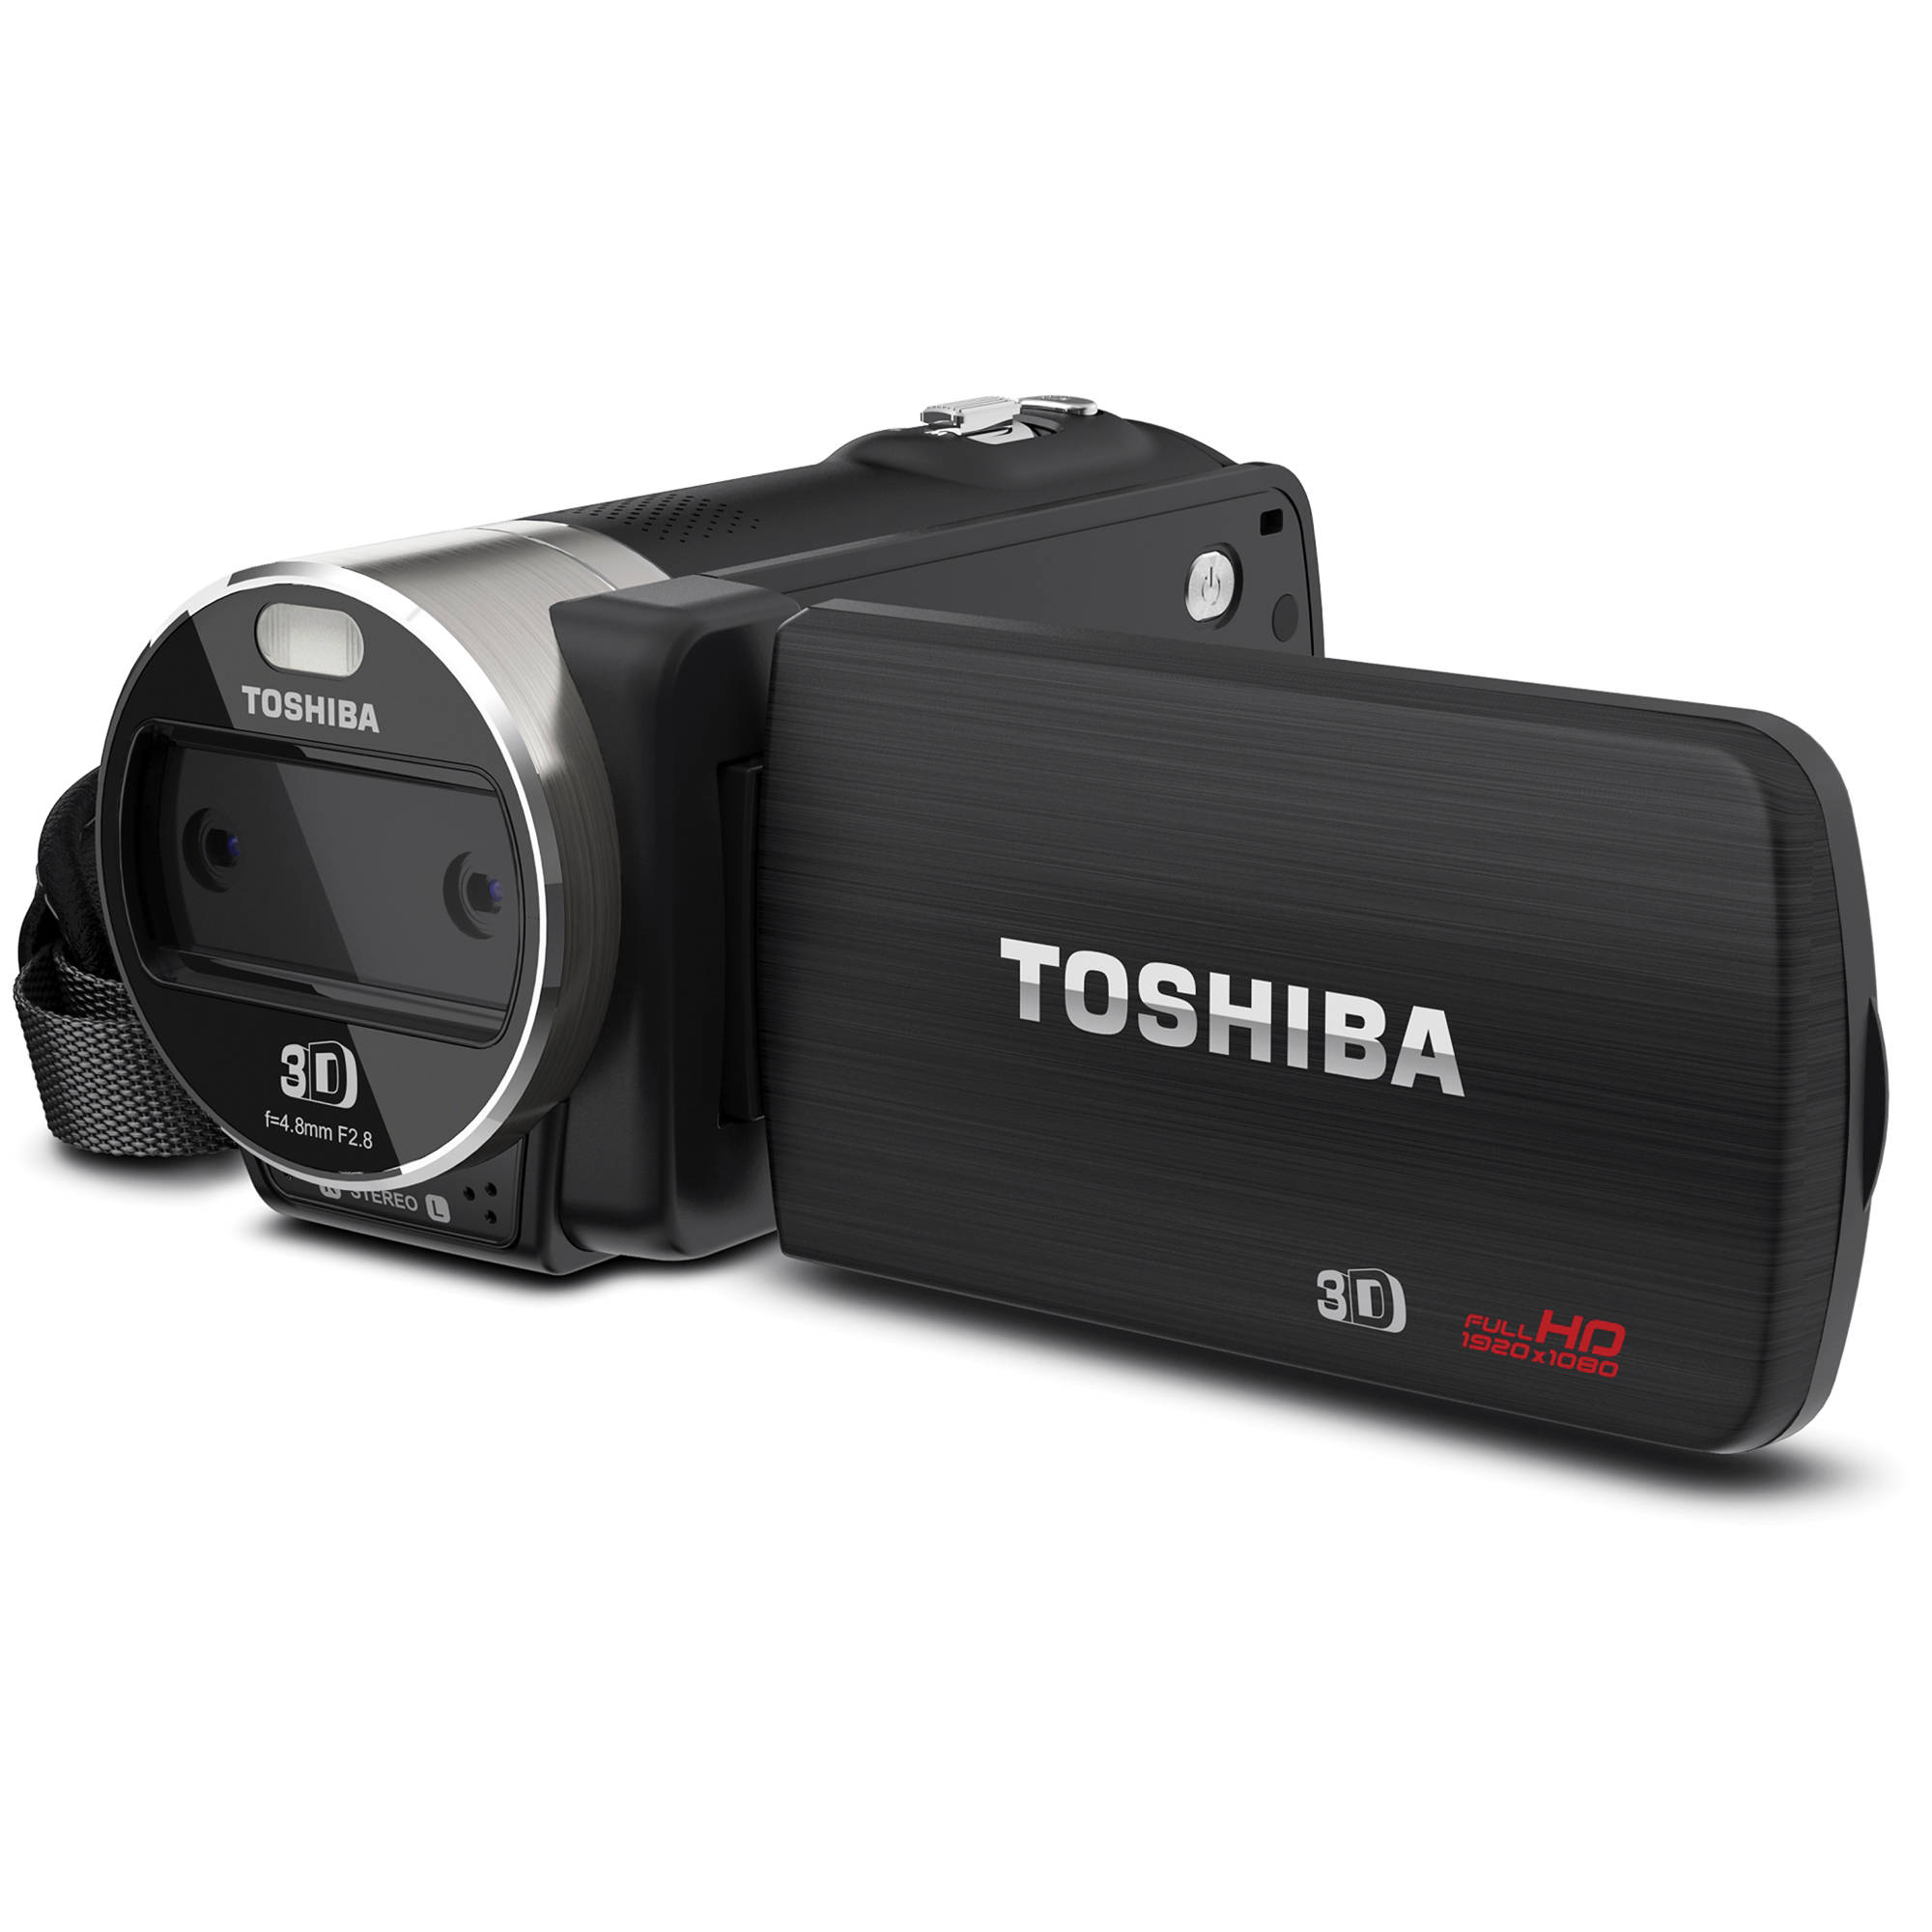 toshiba camileo z100 full hd 3d camcorder pa5012u 1c0k b h photo rh bhphotovideo com Toshiba Camileo B10 Review Toshiba Camcorder Battery